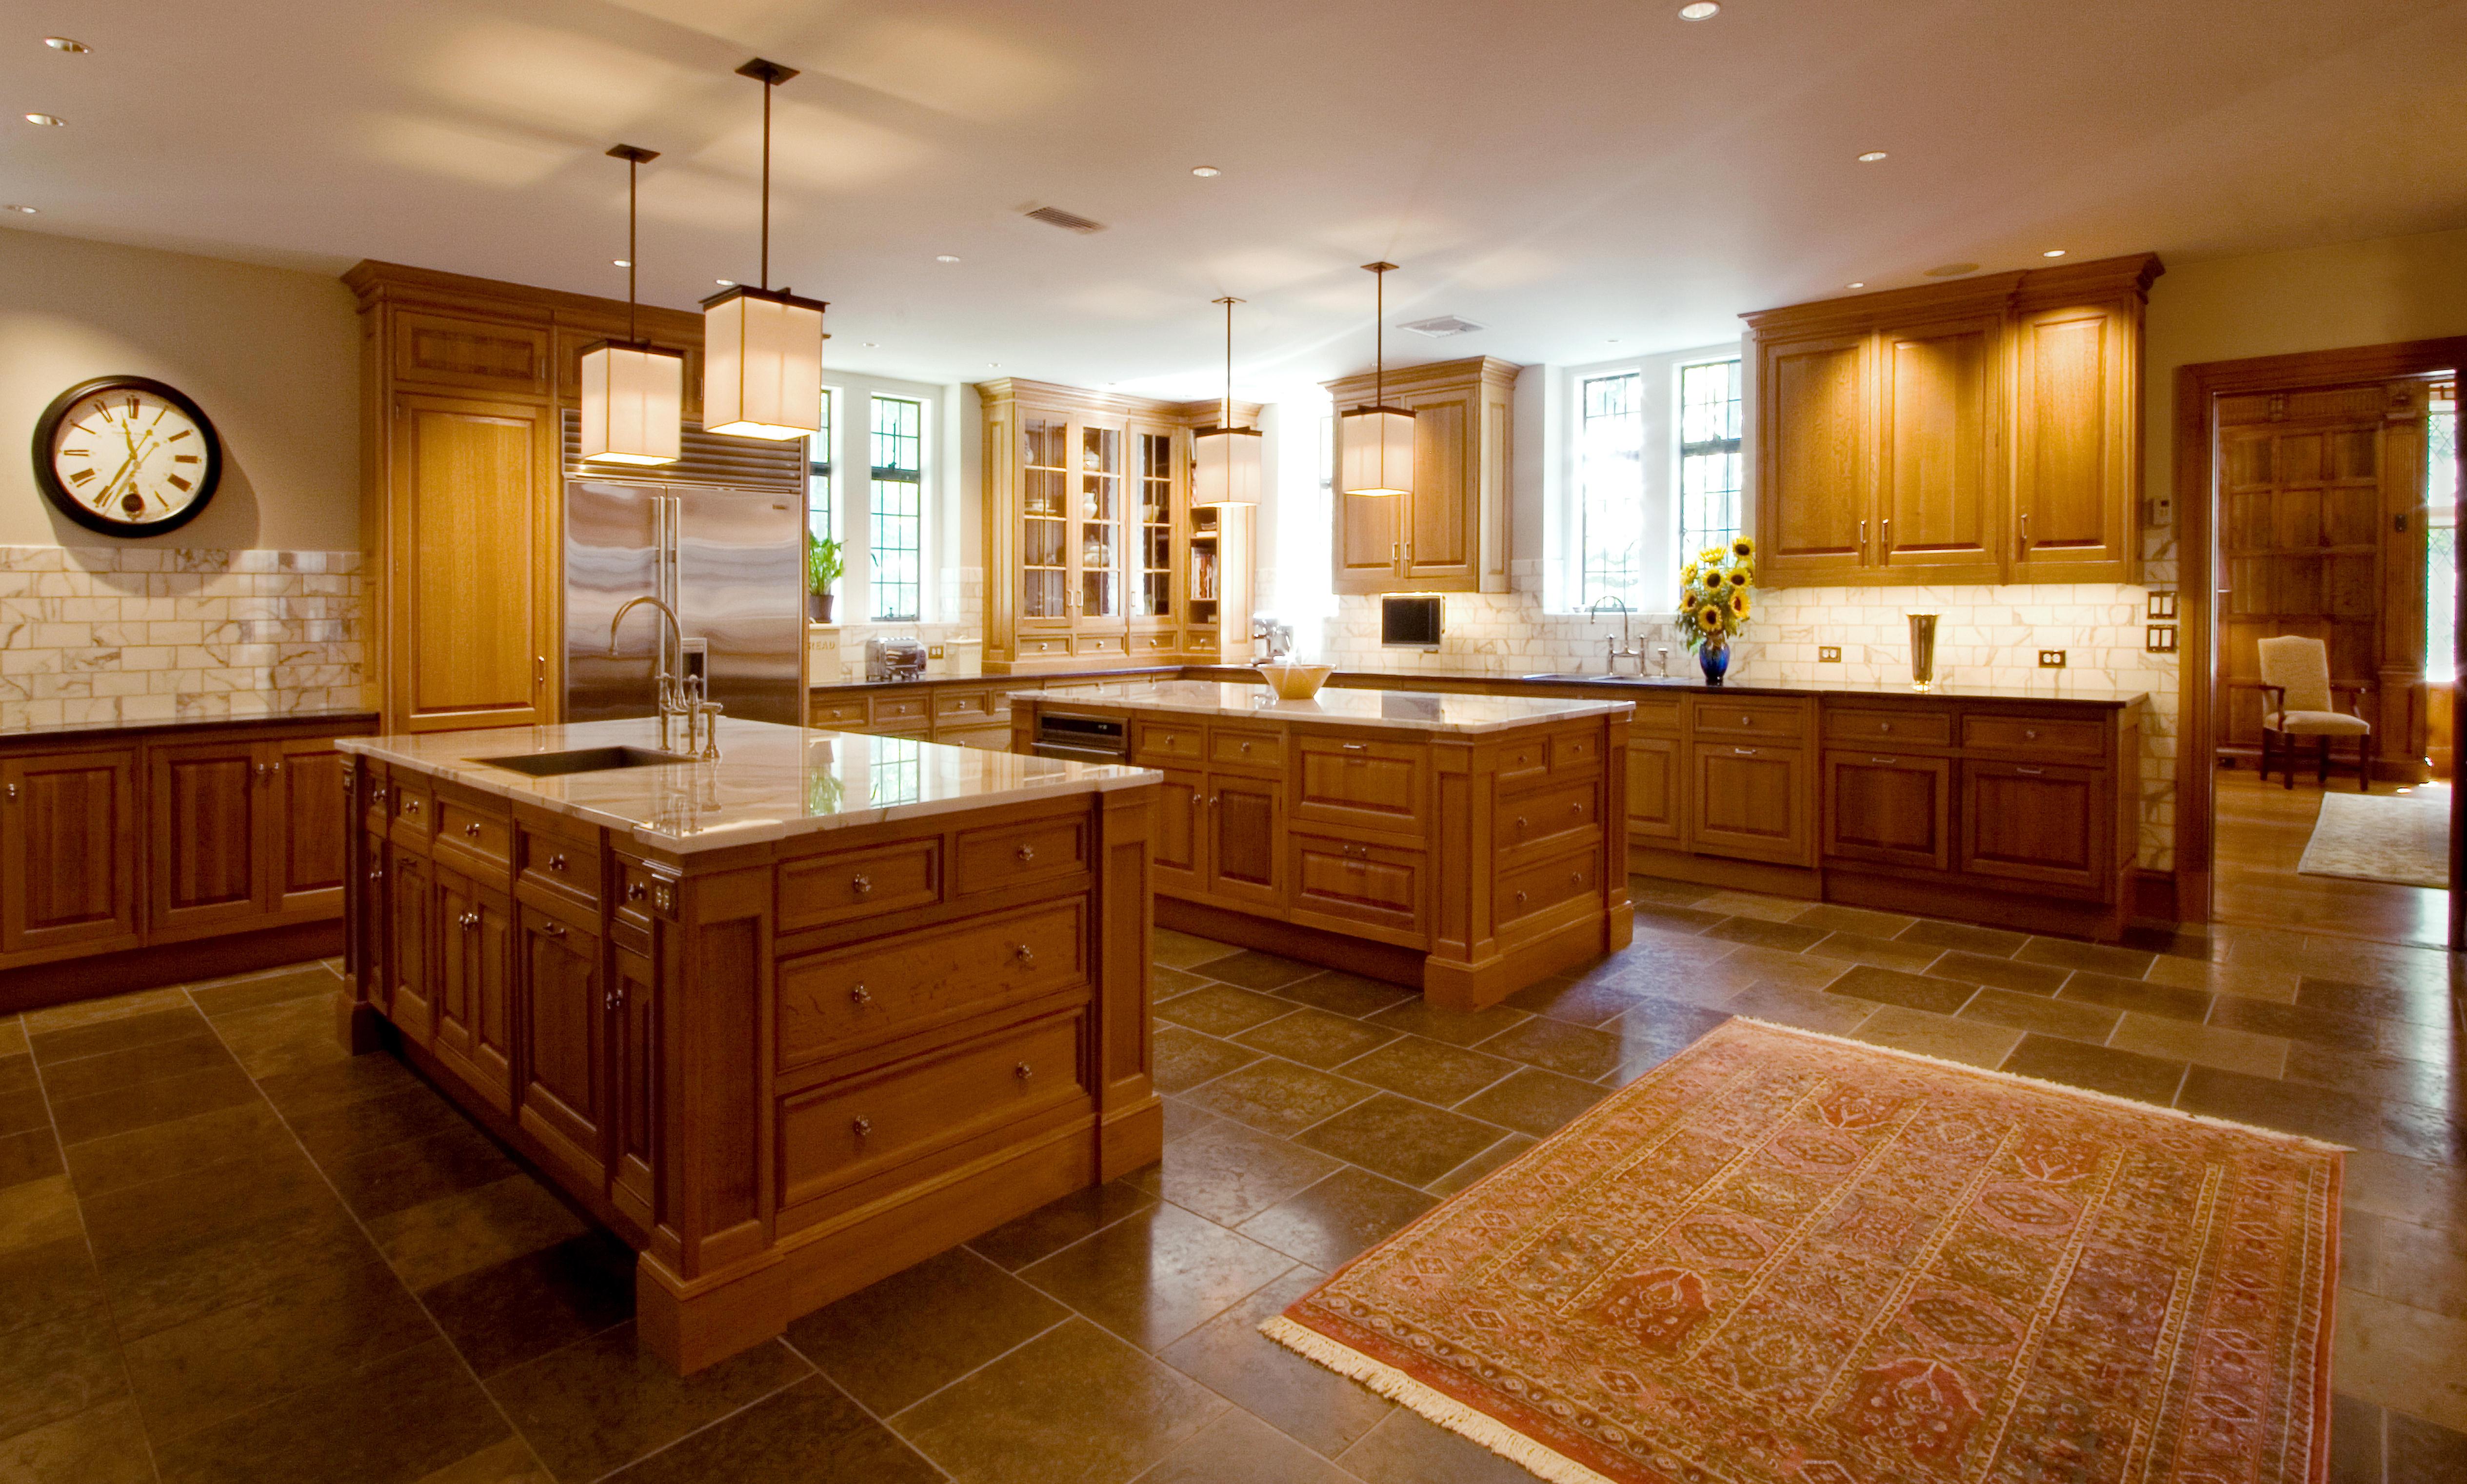 Kitchen island with cabinets Photo - 11